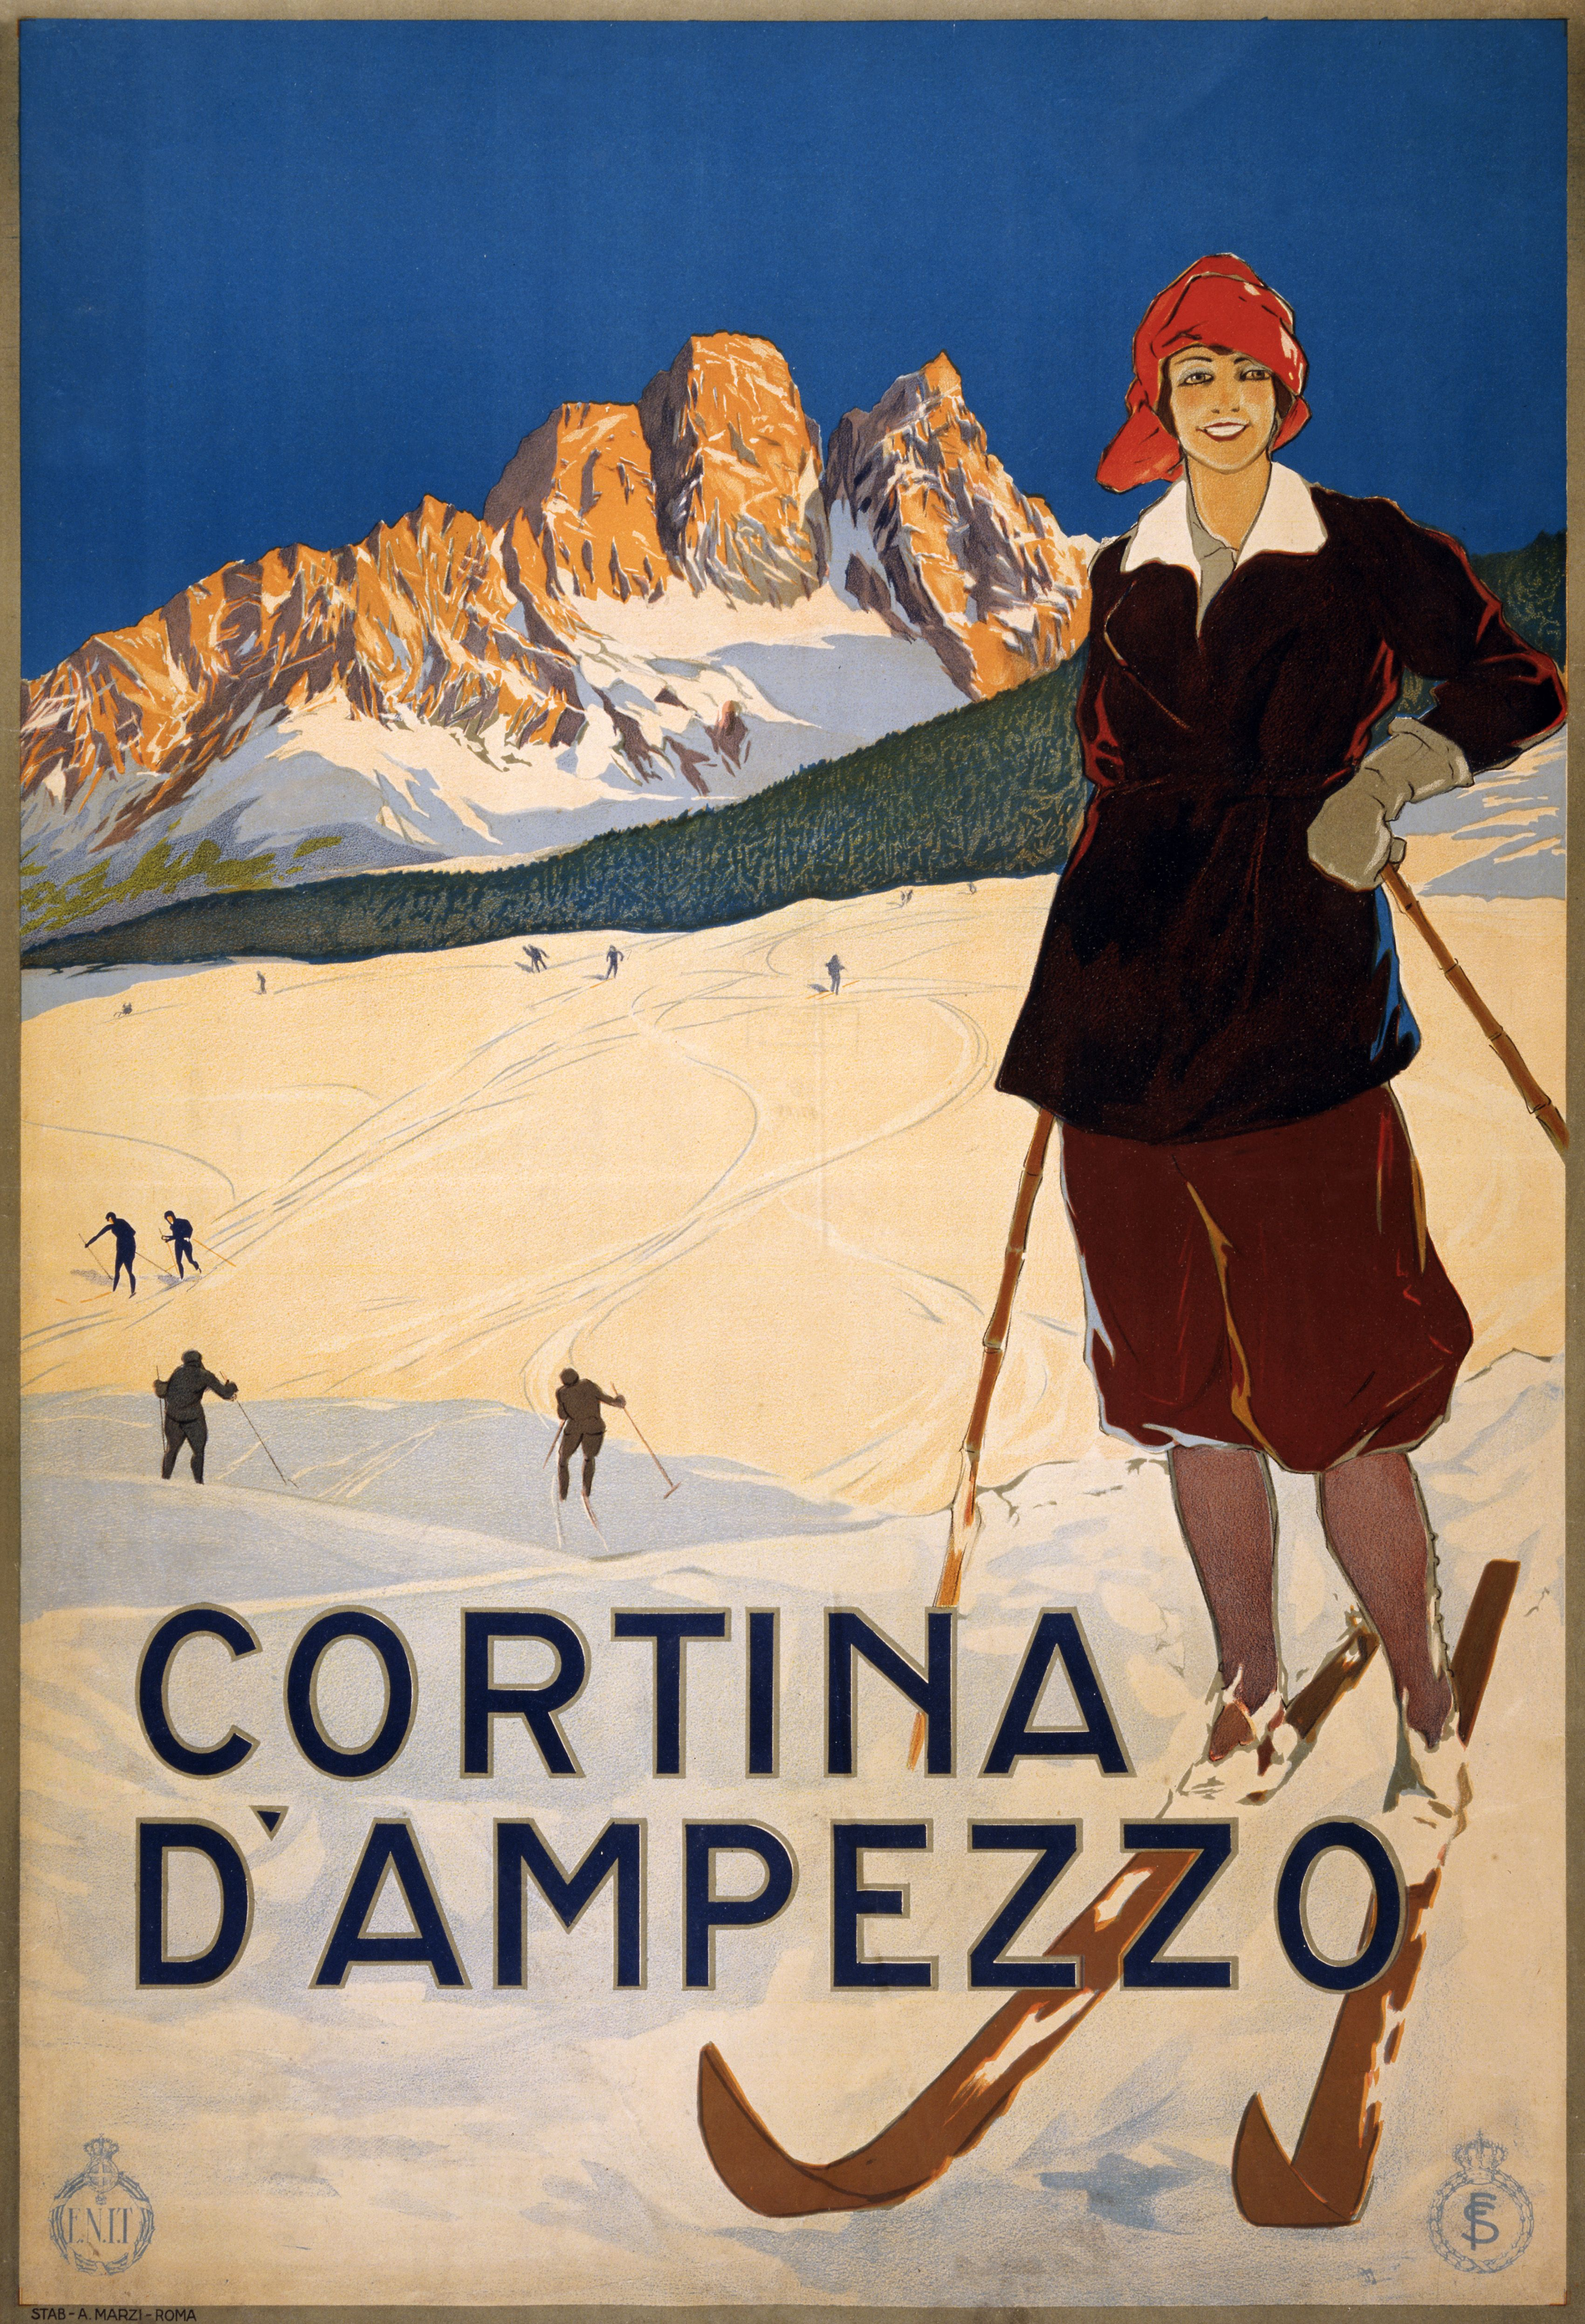 Cortina d'Ampezzo - Wikipedia, the free encyclopedia   Retro Posters